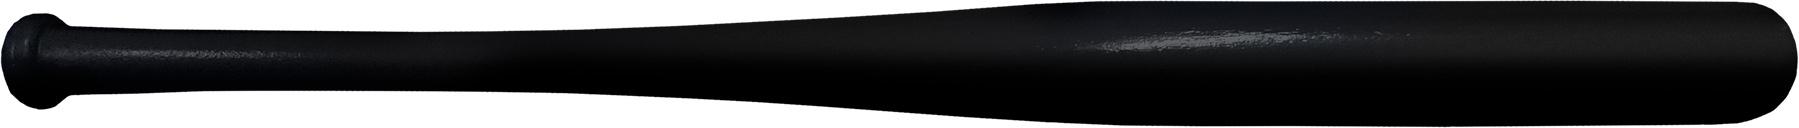 novelty black baseball bat souvenir baseball bat